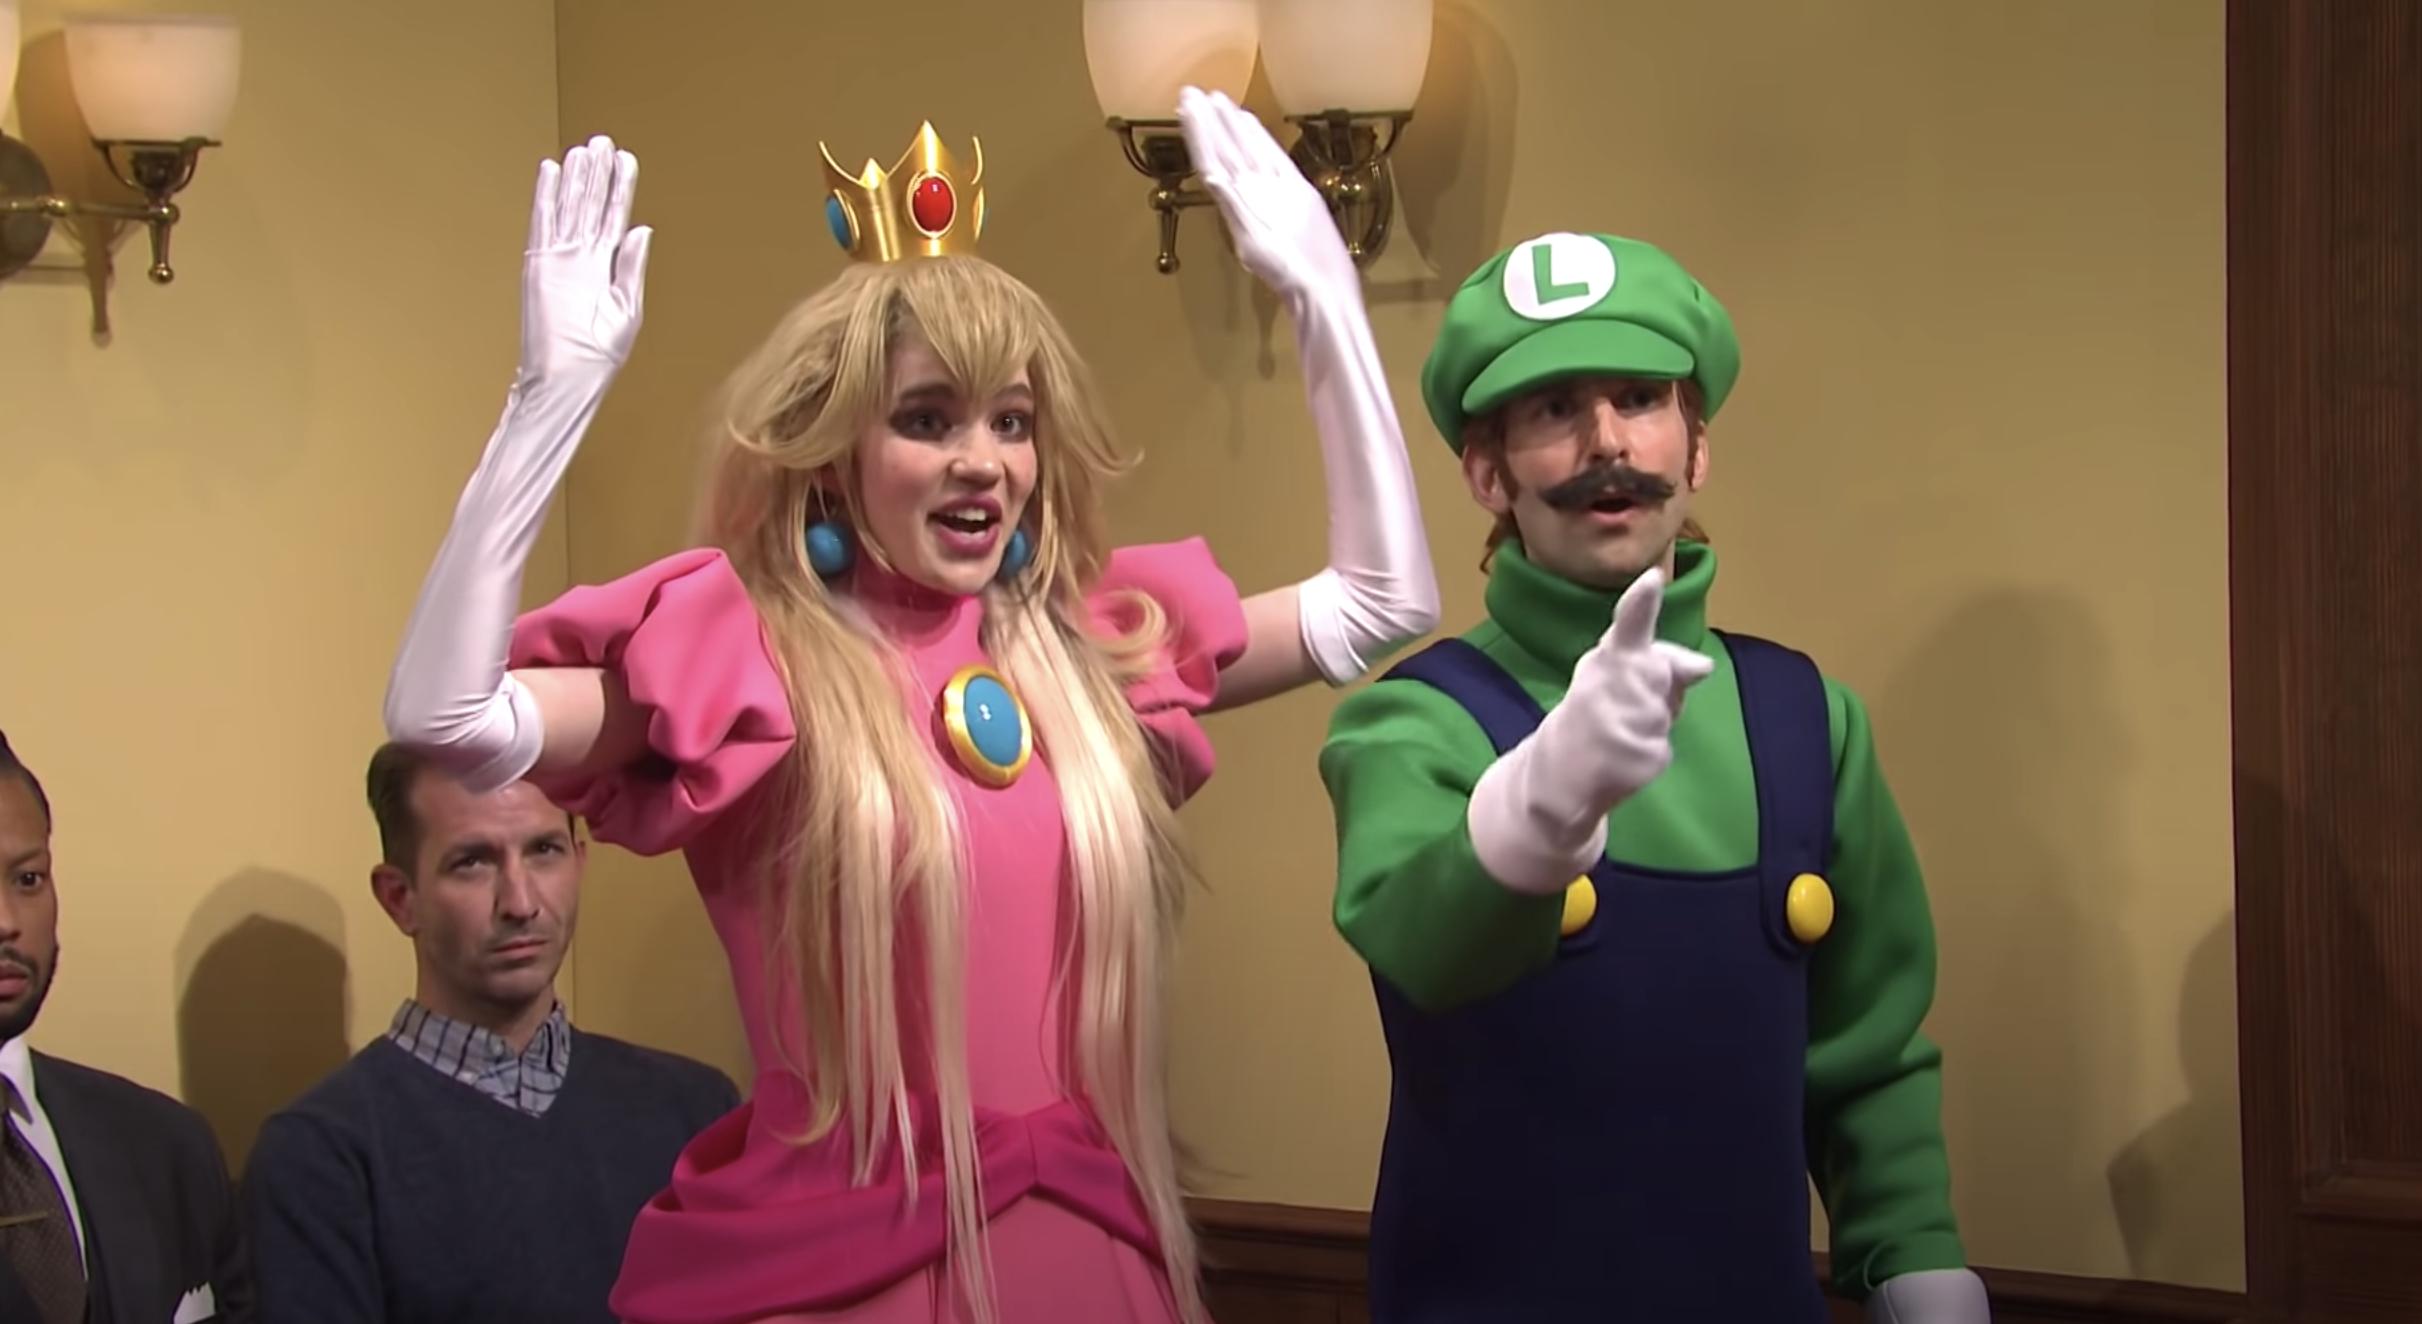 See Grimes as Princess Peach, Elon Musk as Wario in 'SNL' Mario Murder Trial Sketch - Rolling Stone